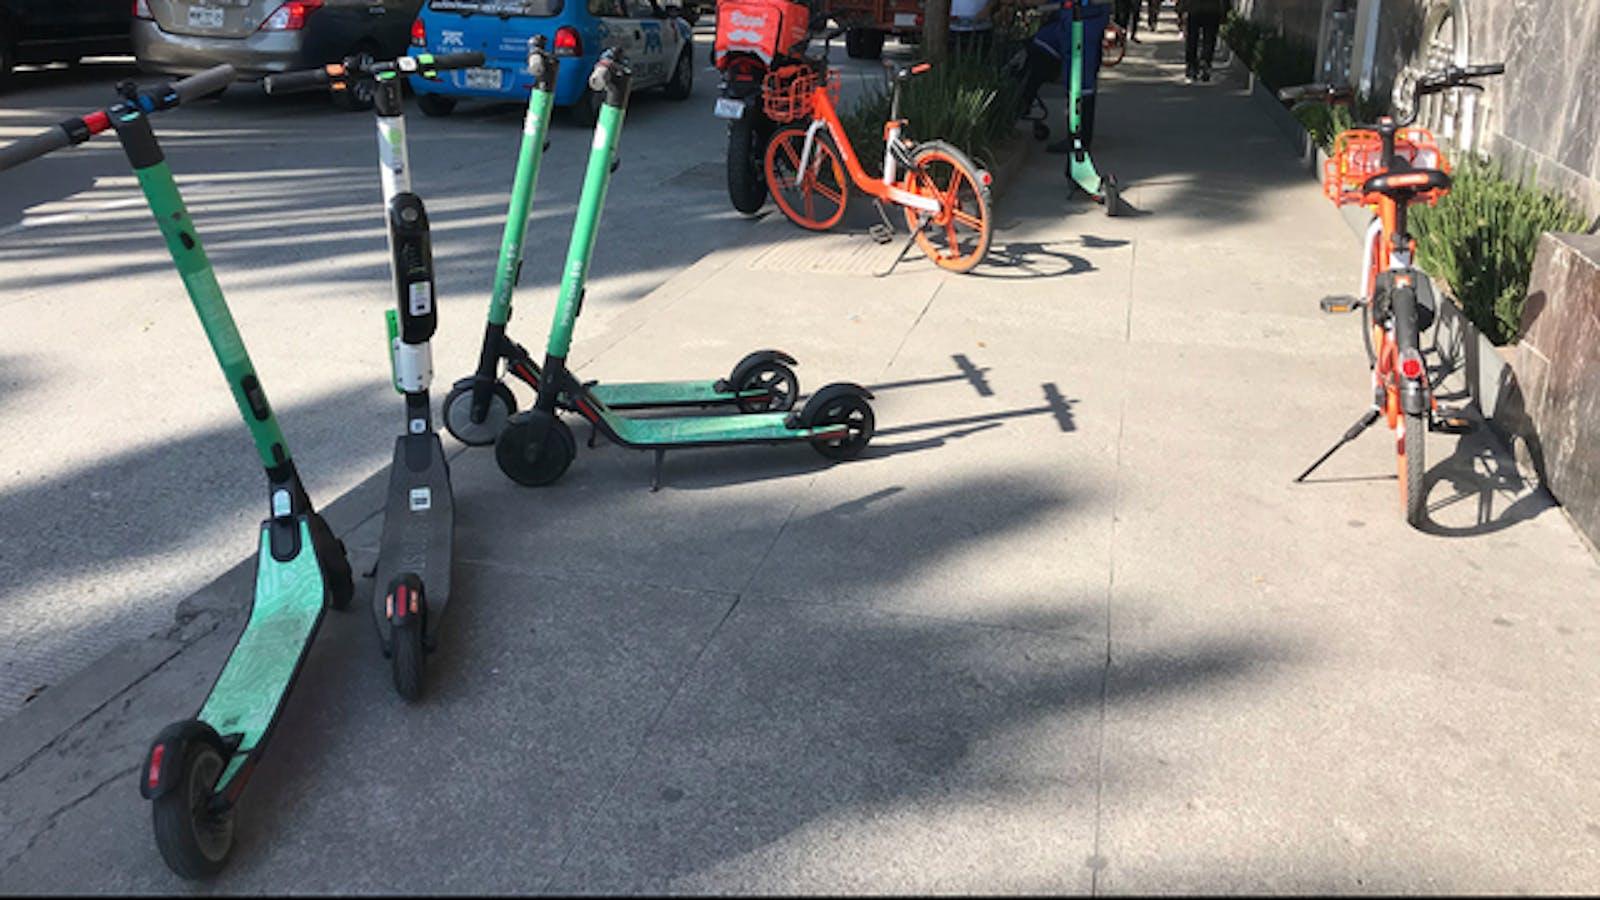 Scooters belonging to Mexico's Grin. Photo: Carlos Felipe Pardo/Flickr